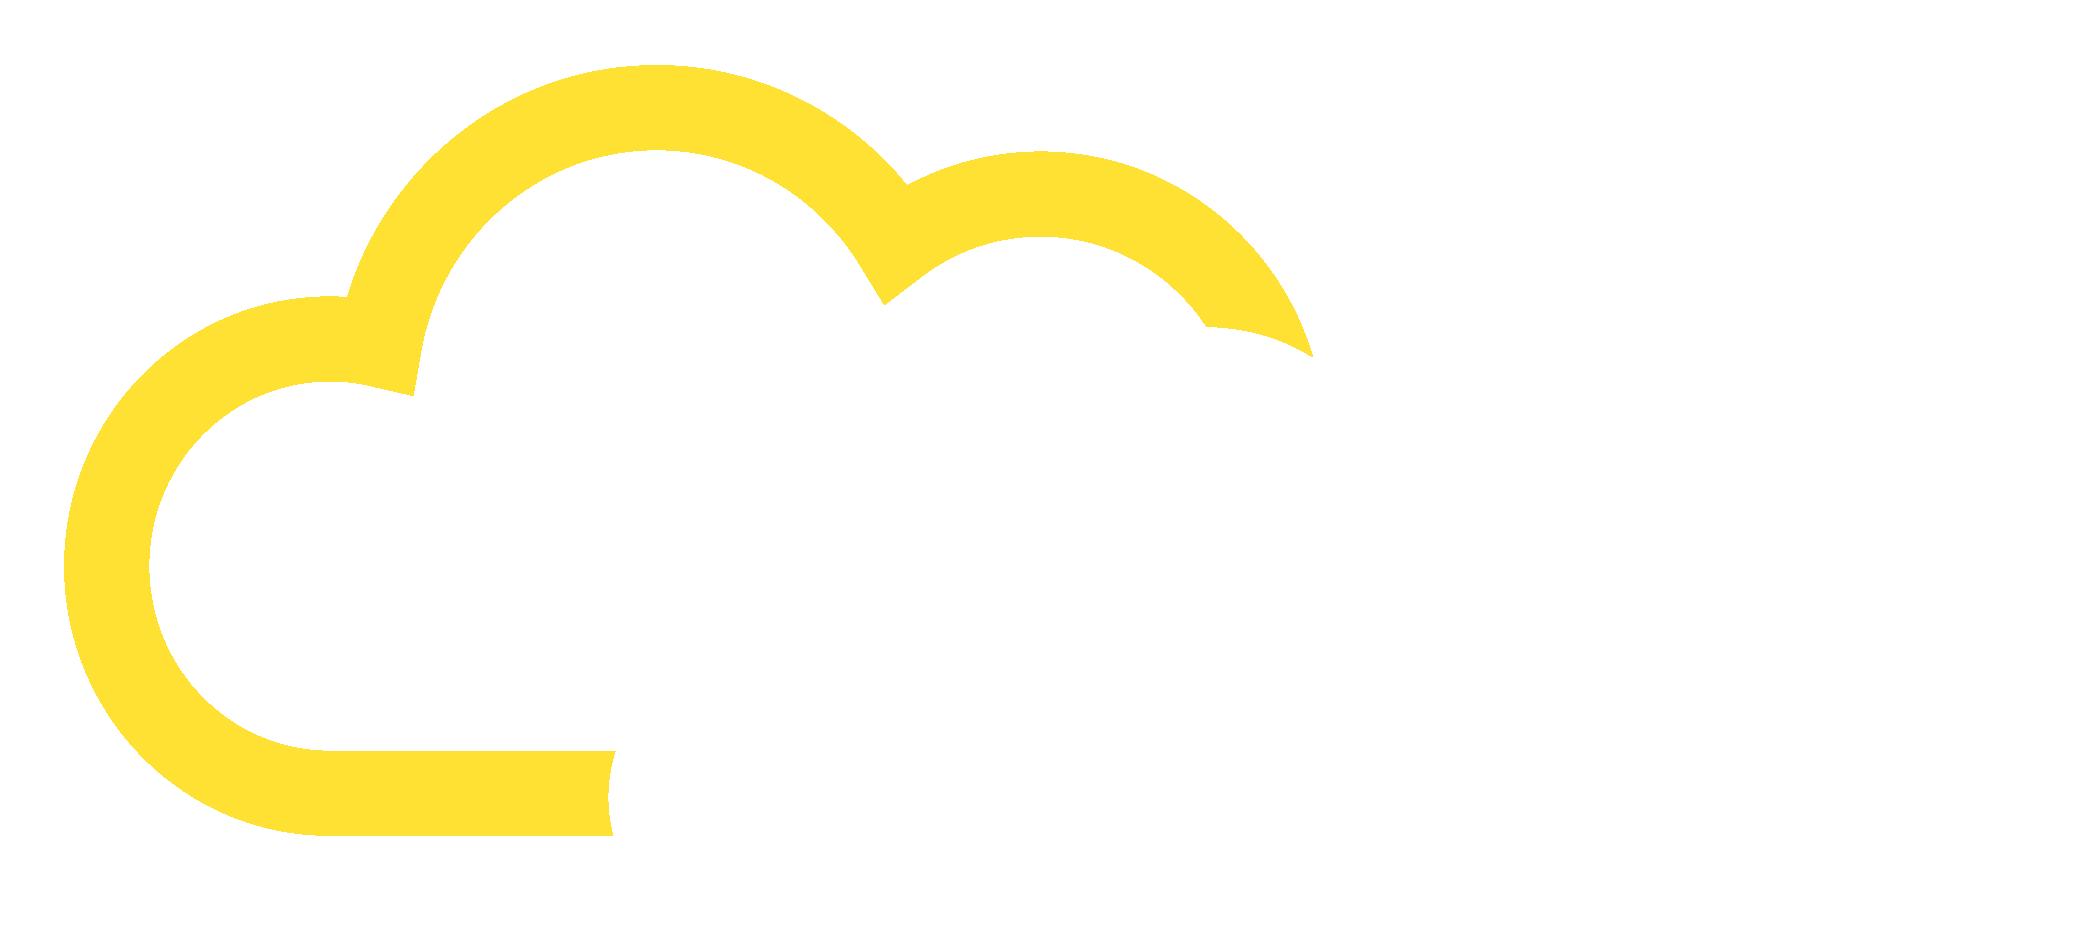 Focus on Salesforce